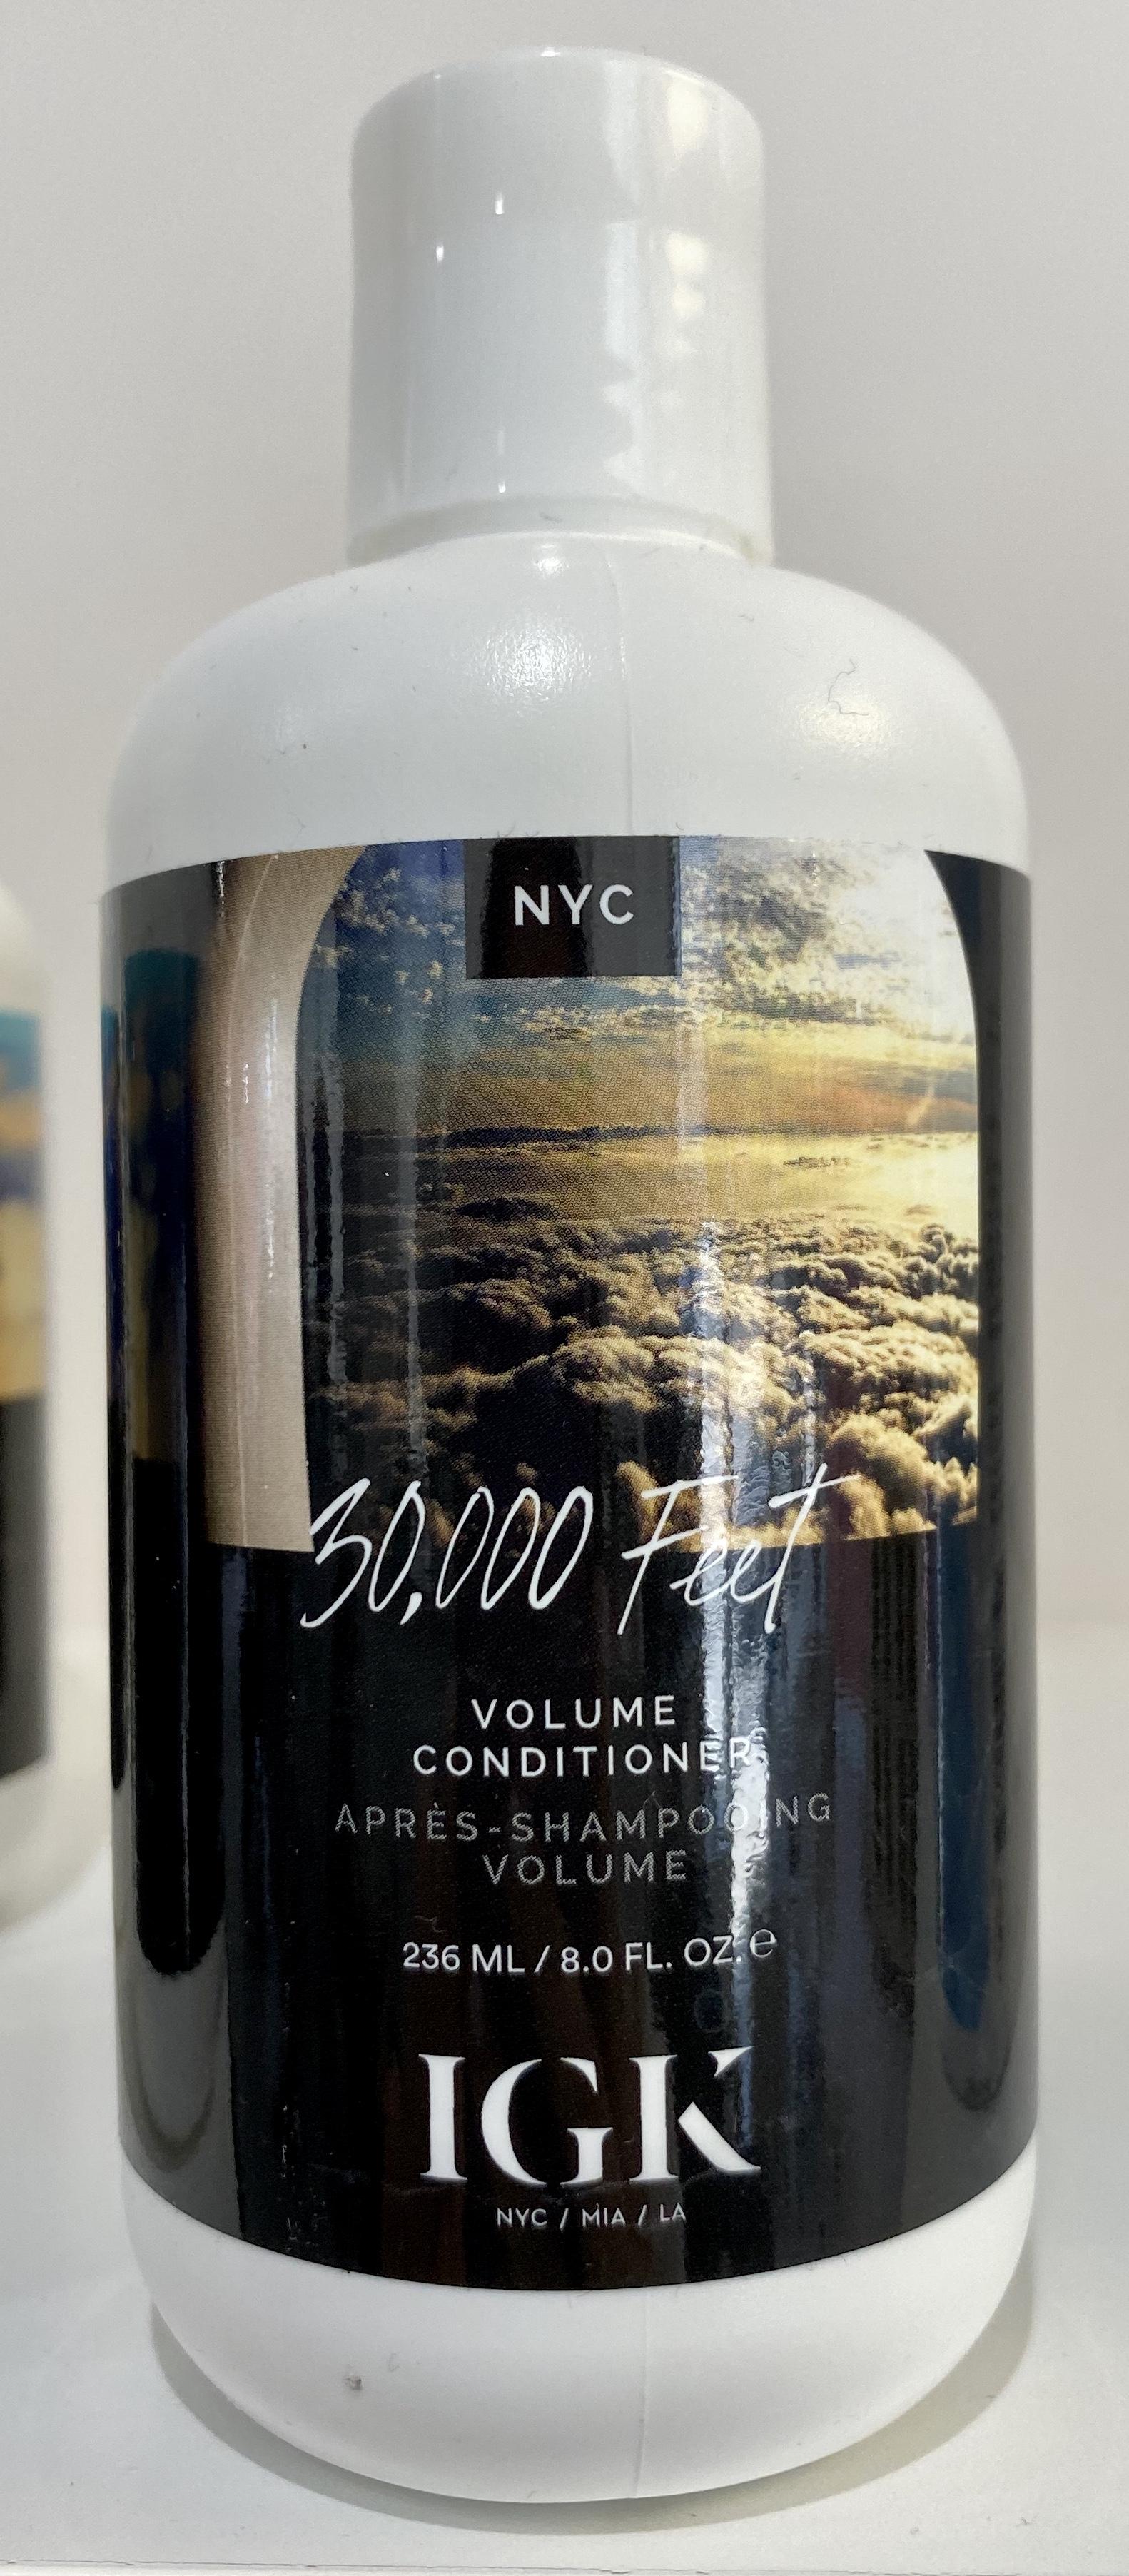 30,000 Ft. Conditioner